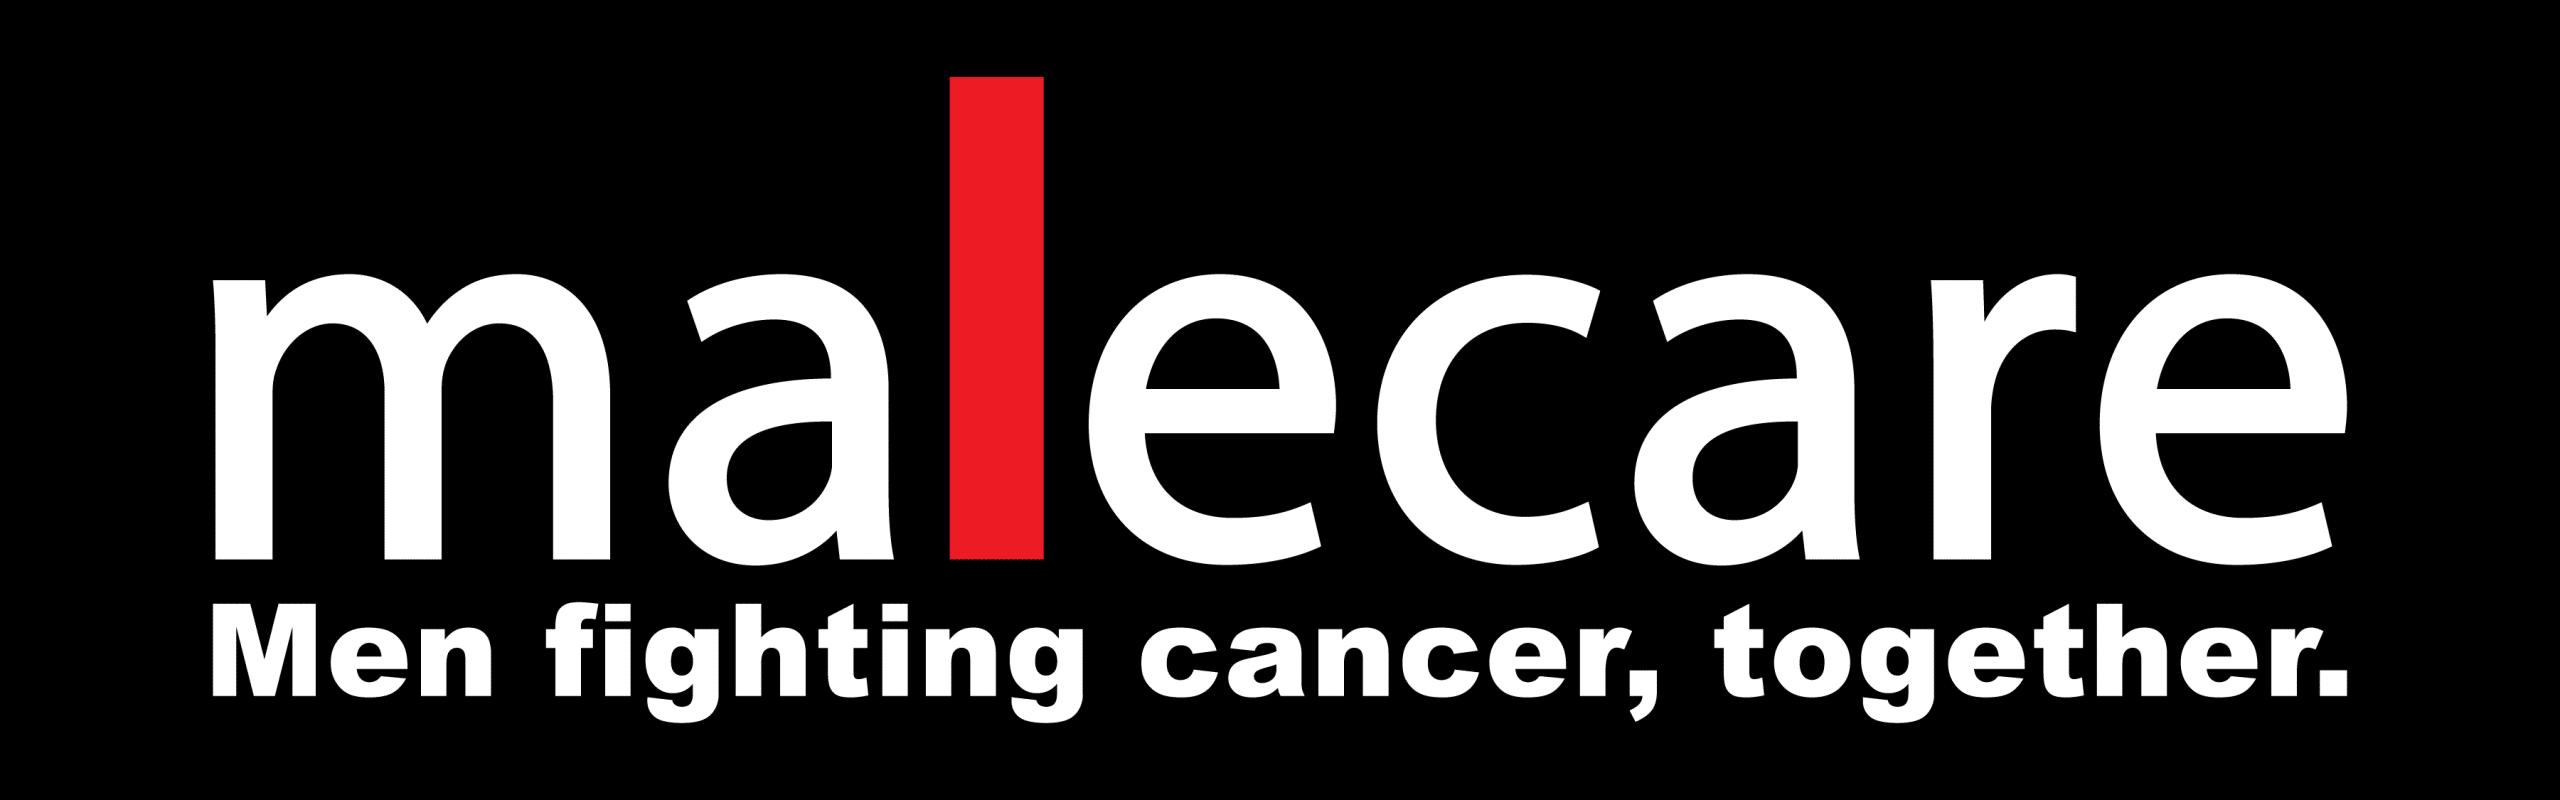 malecare.org Retina Logo